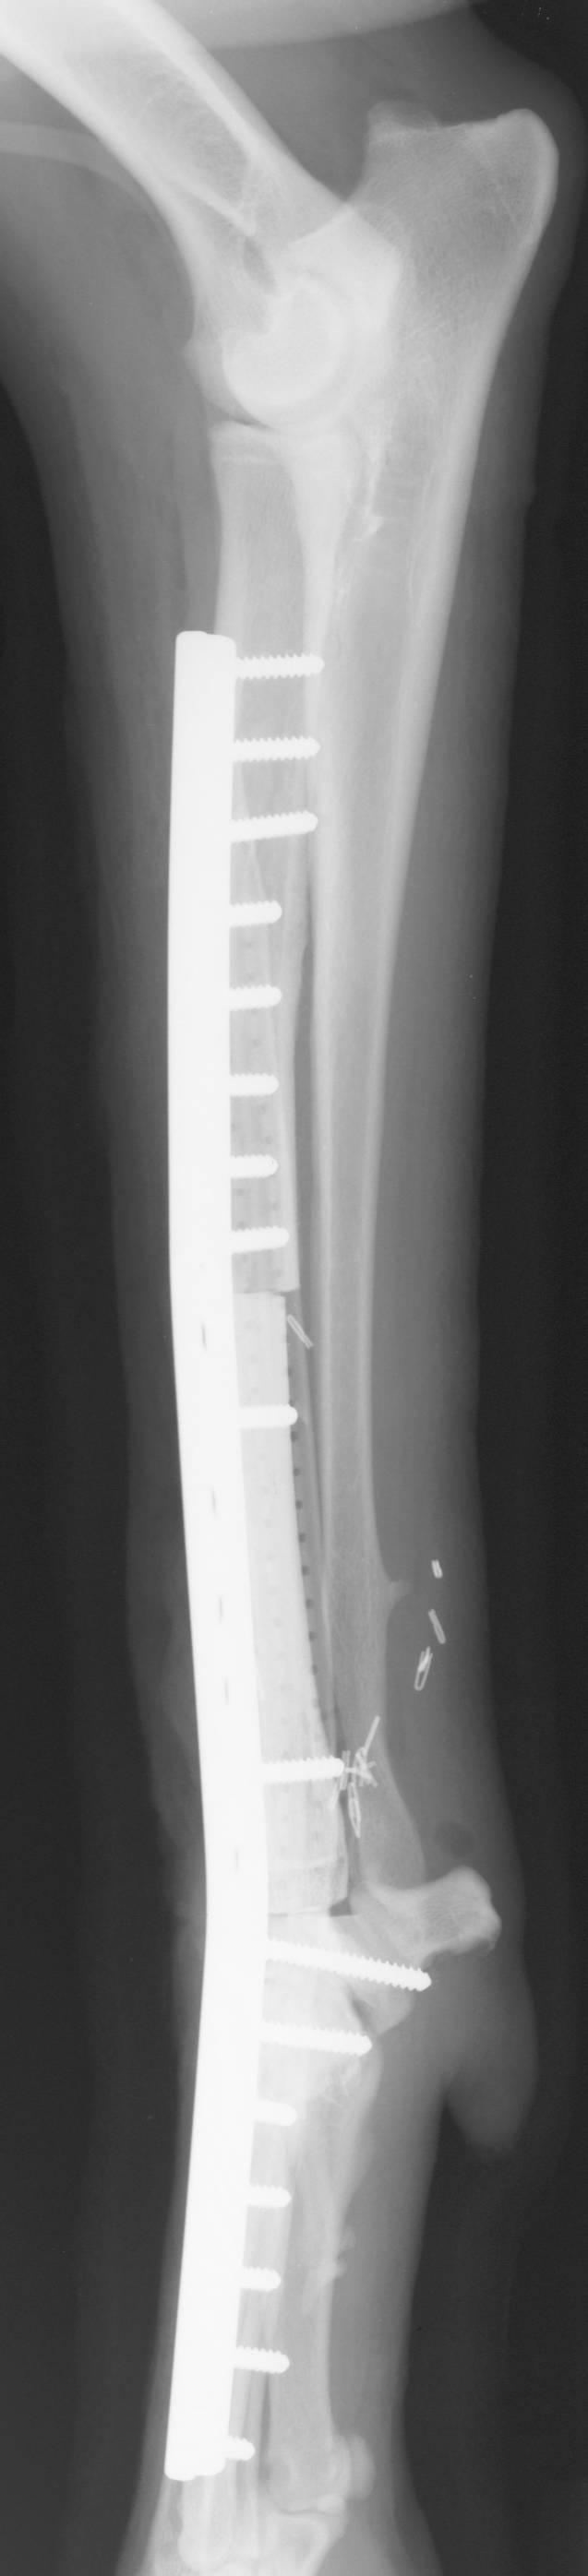 Cortical Allograft Limb-Sparing Surgery